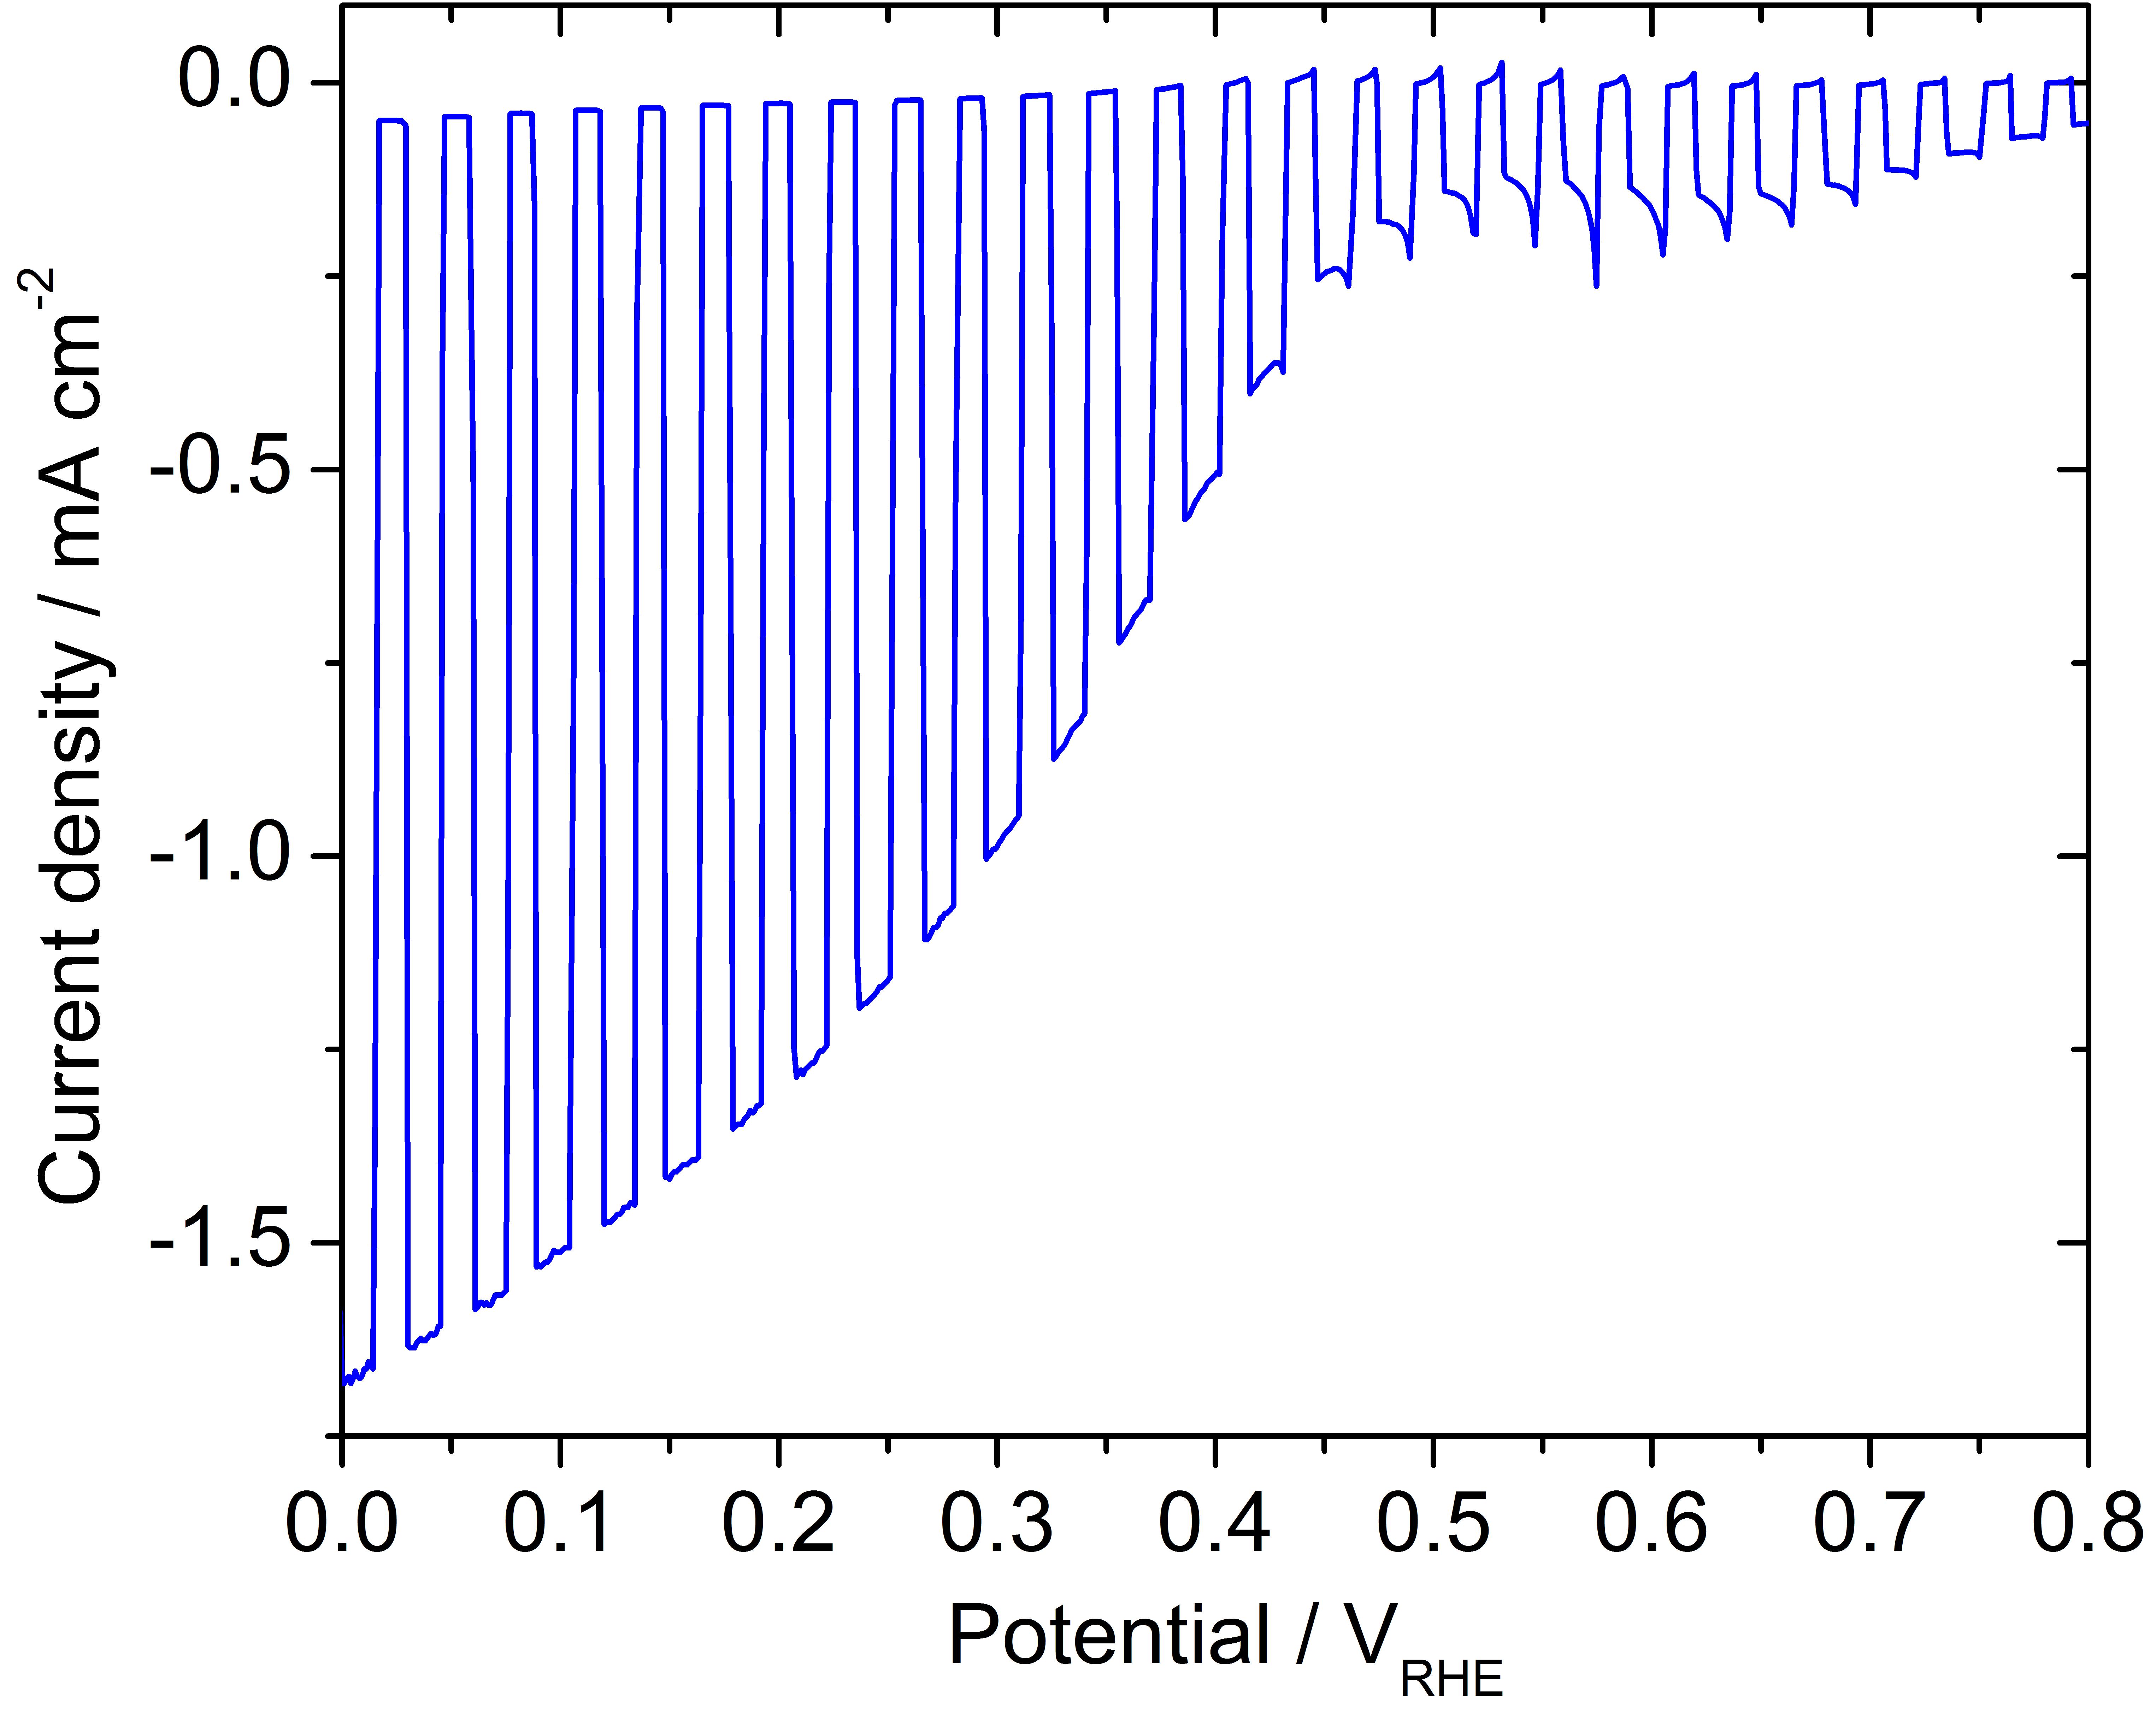 UZH - URPP LightChEC - Photoelectrochemical Water Splitting